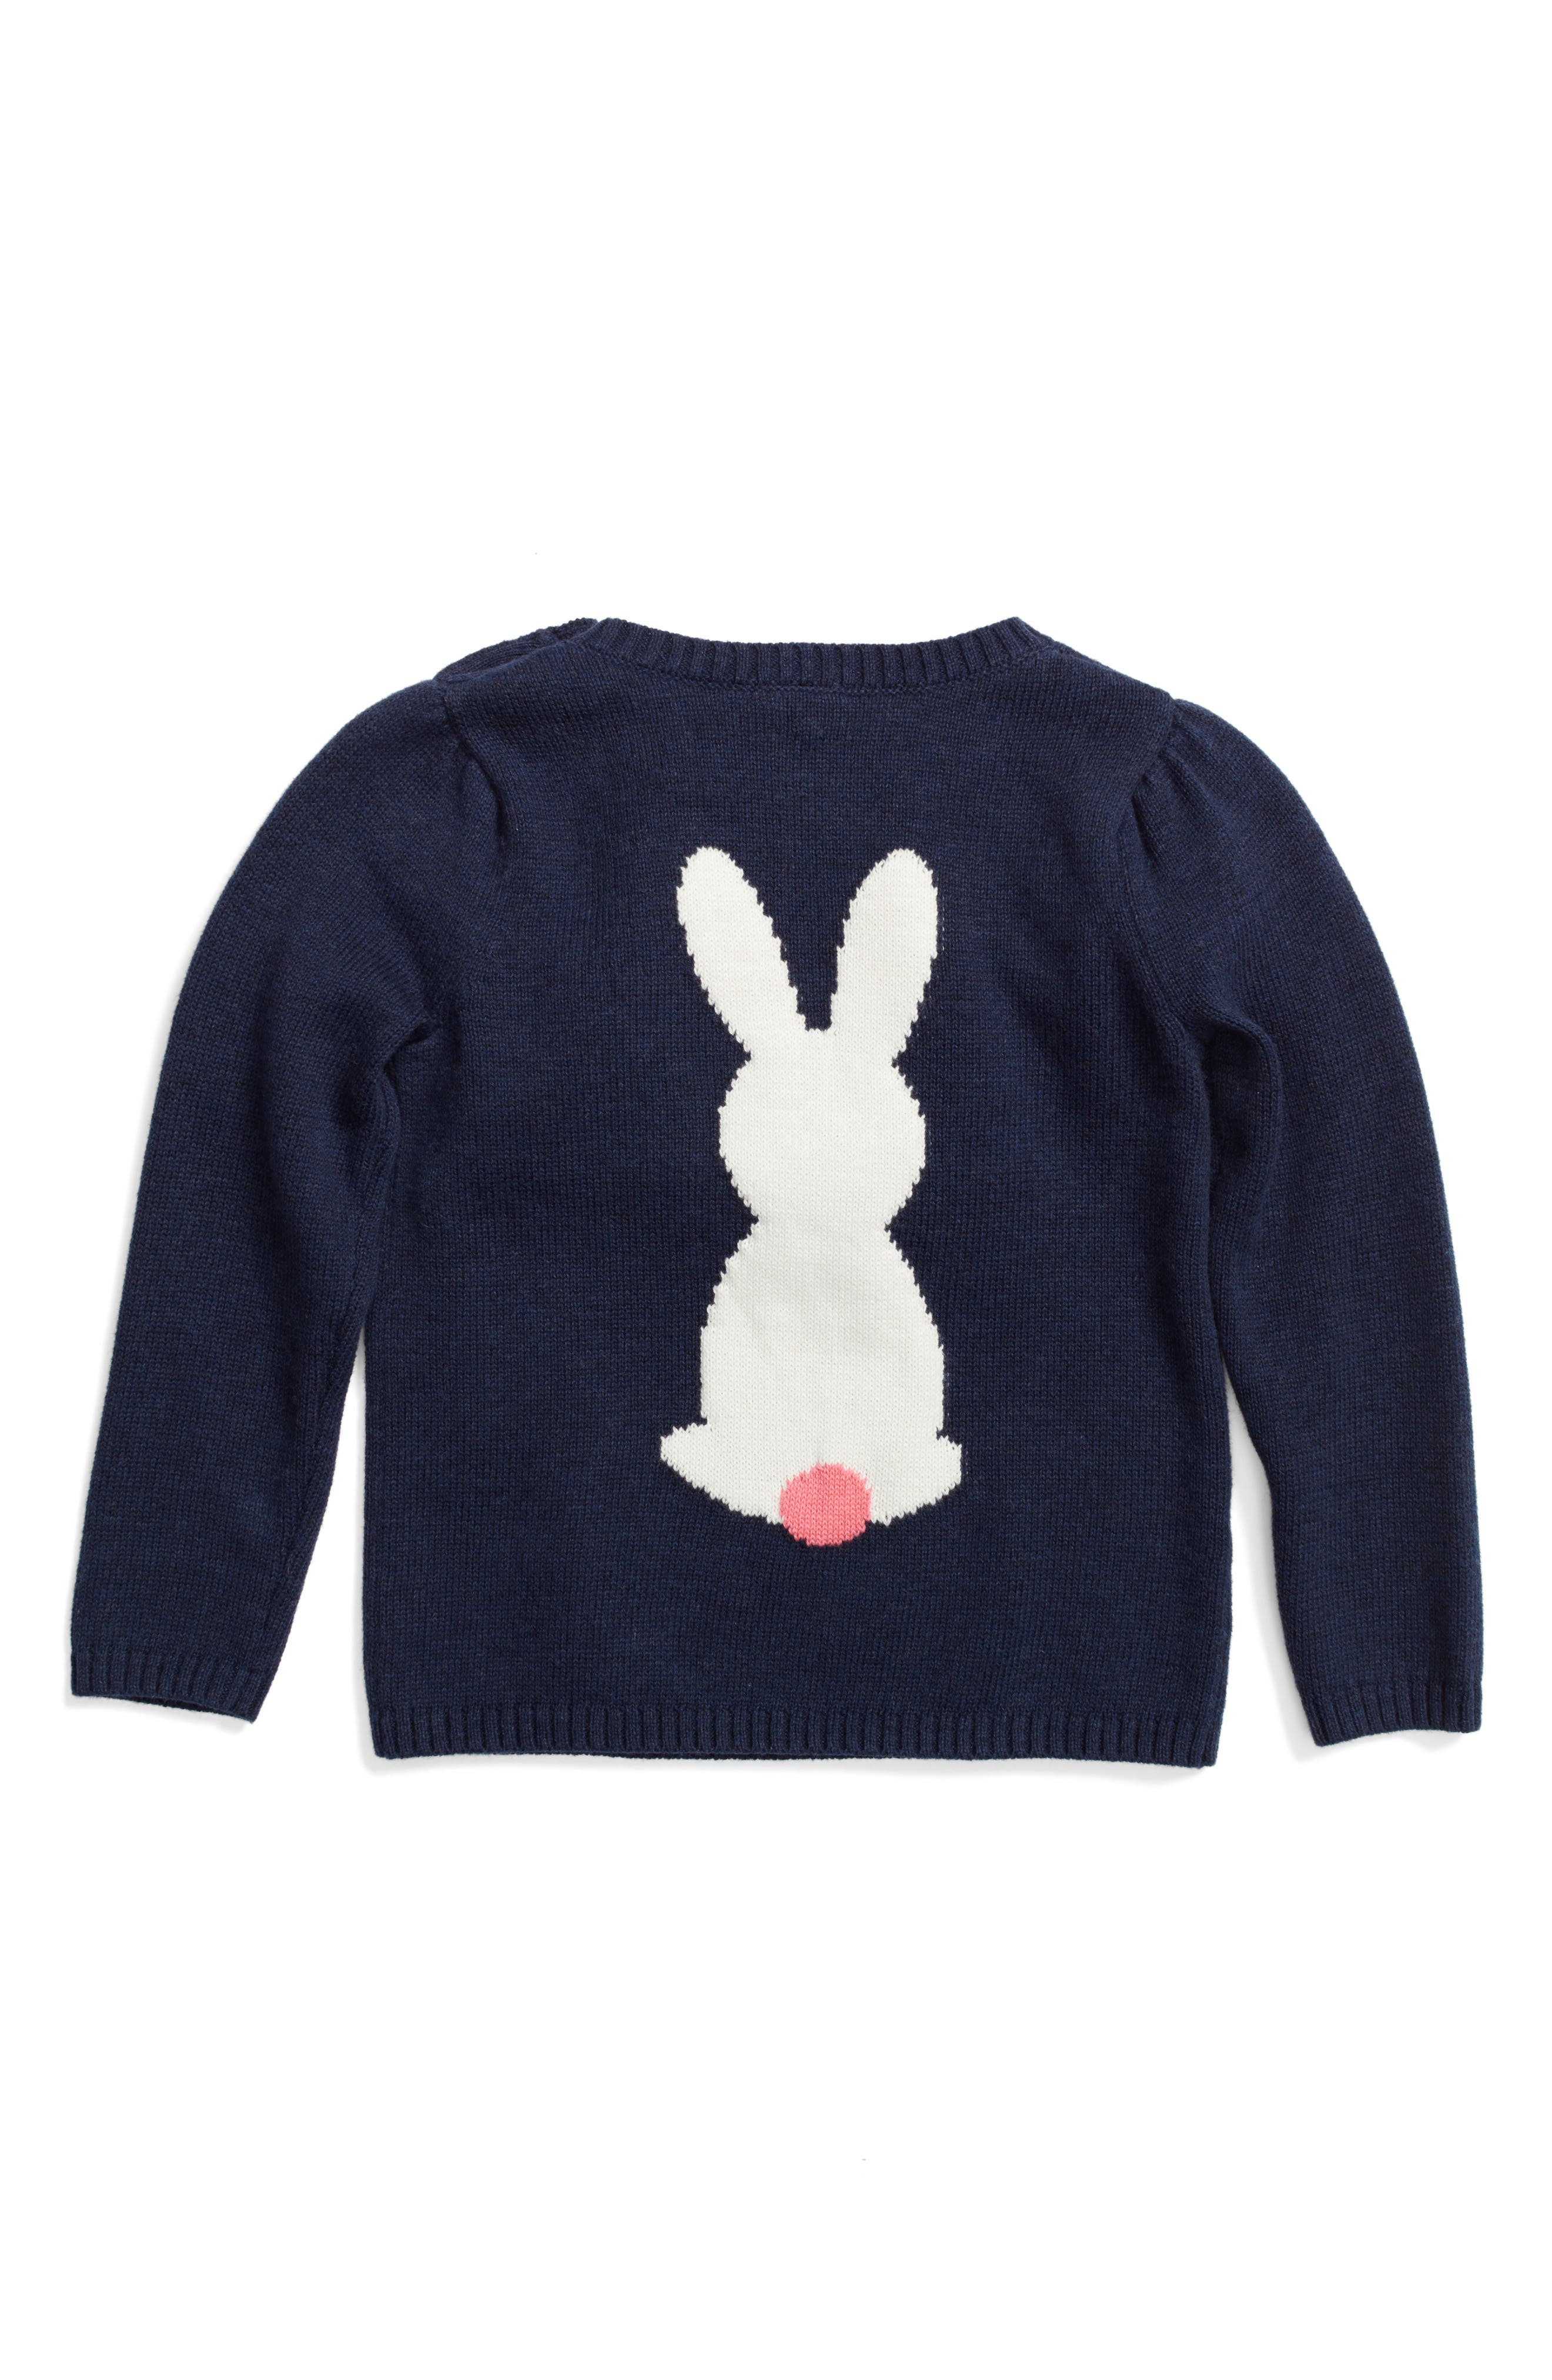 Bunny Sweater,                             Main thumbnail 1, color,                             410